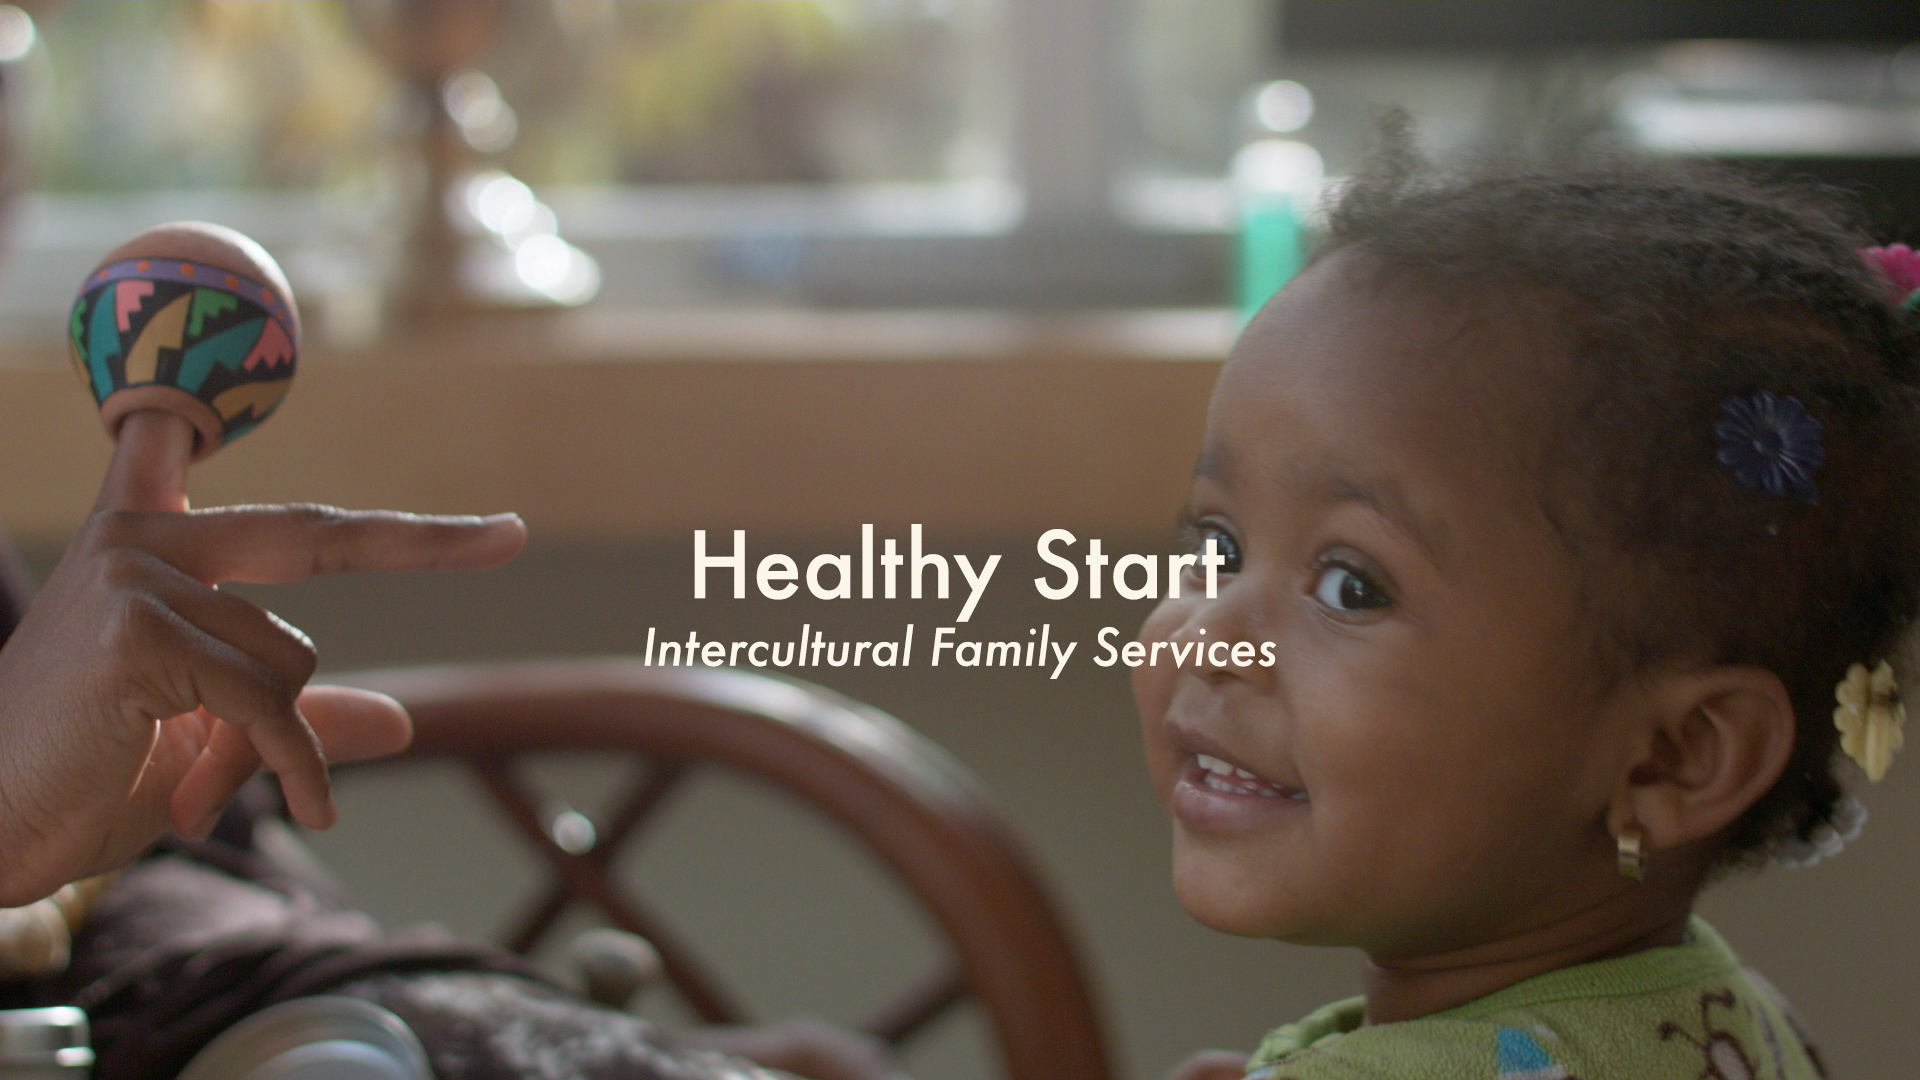 Healthy Start Website + Text.png